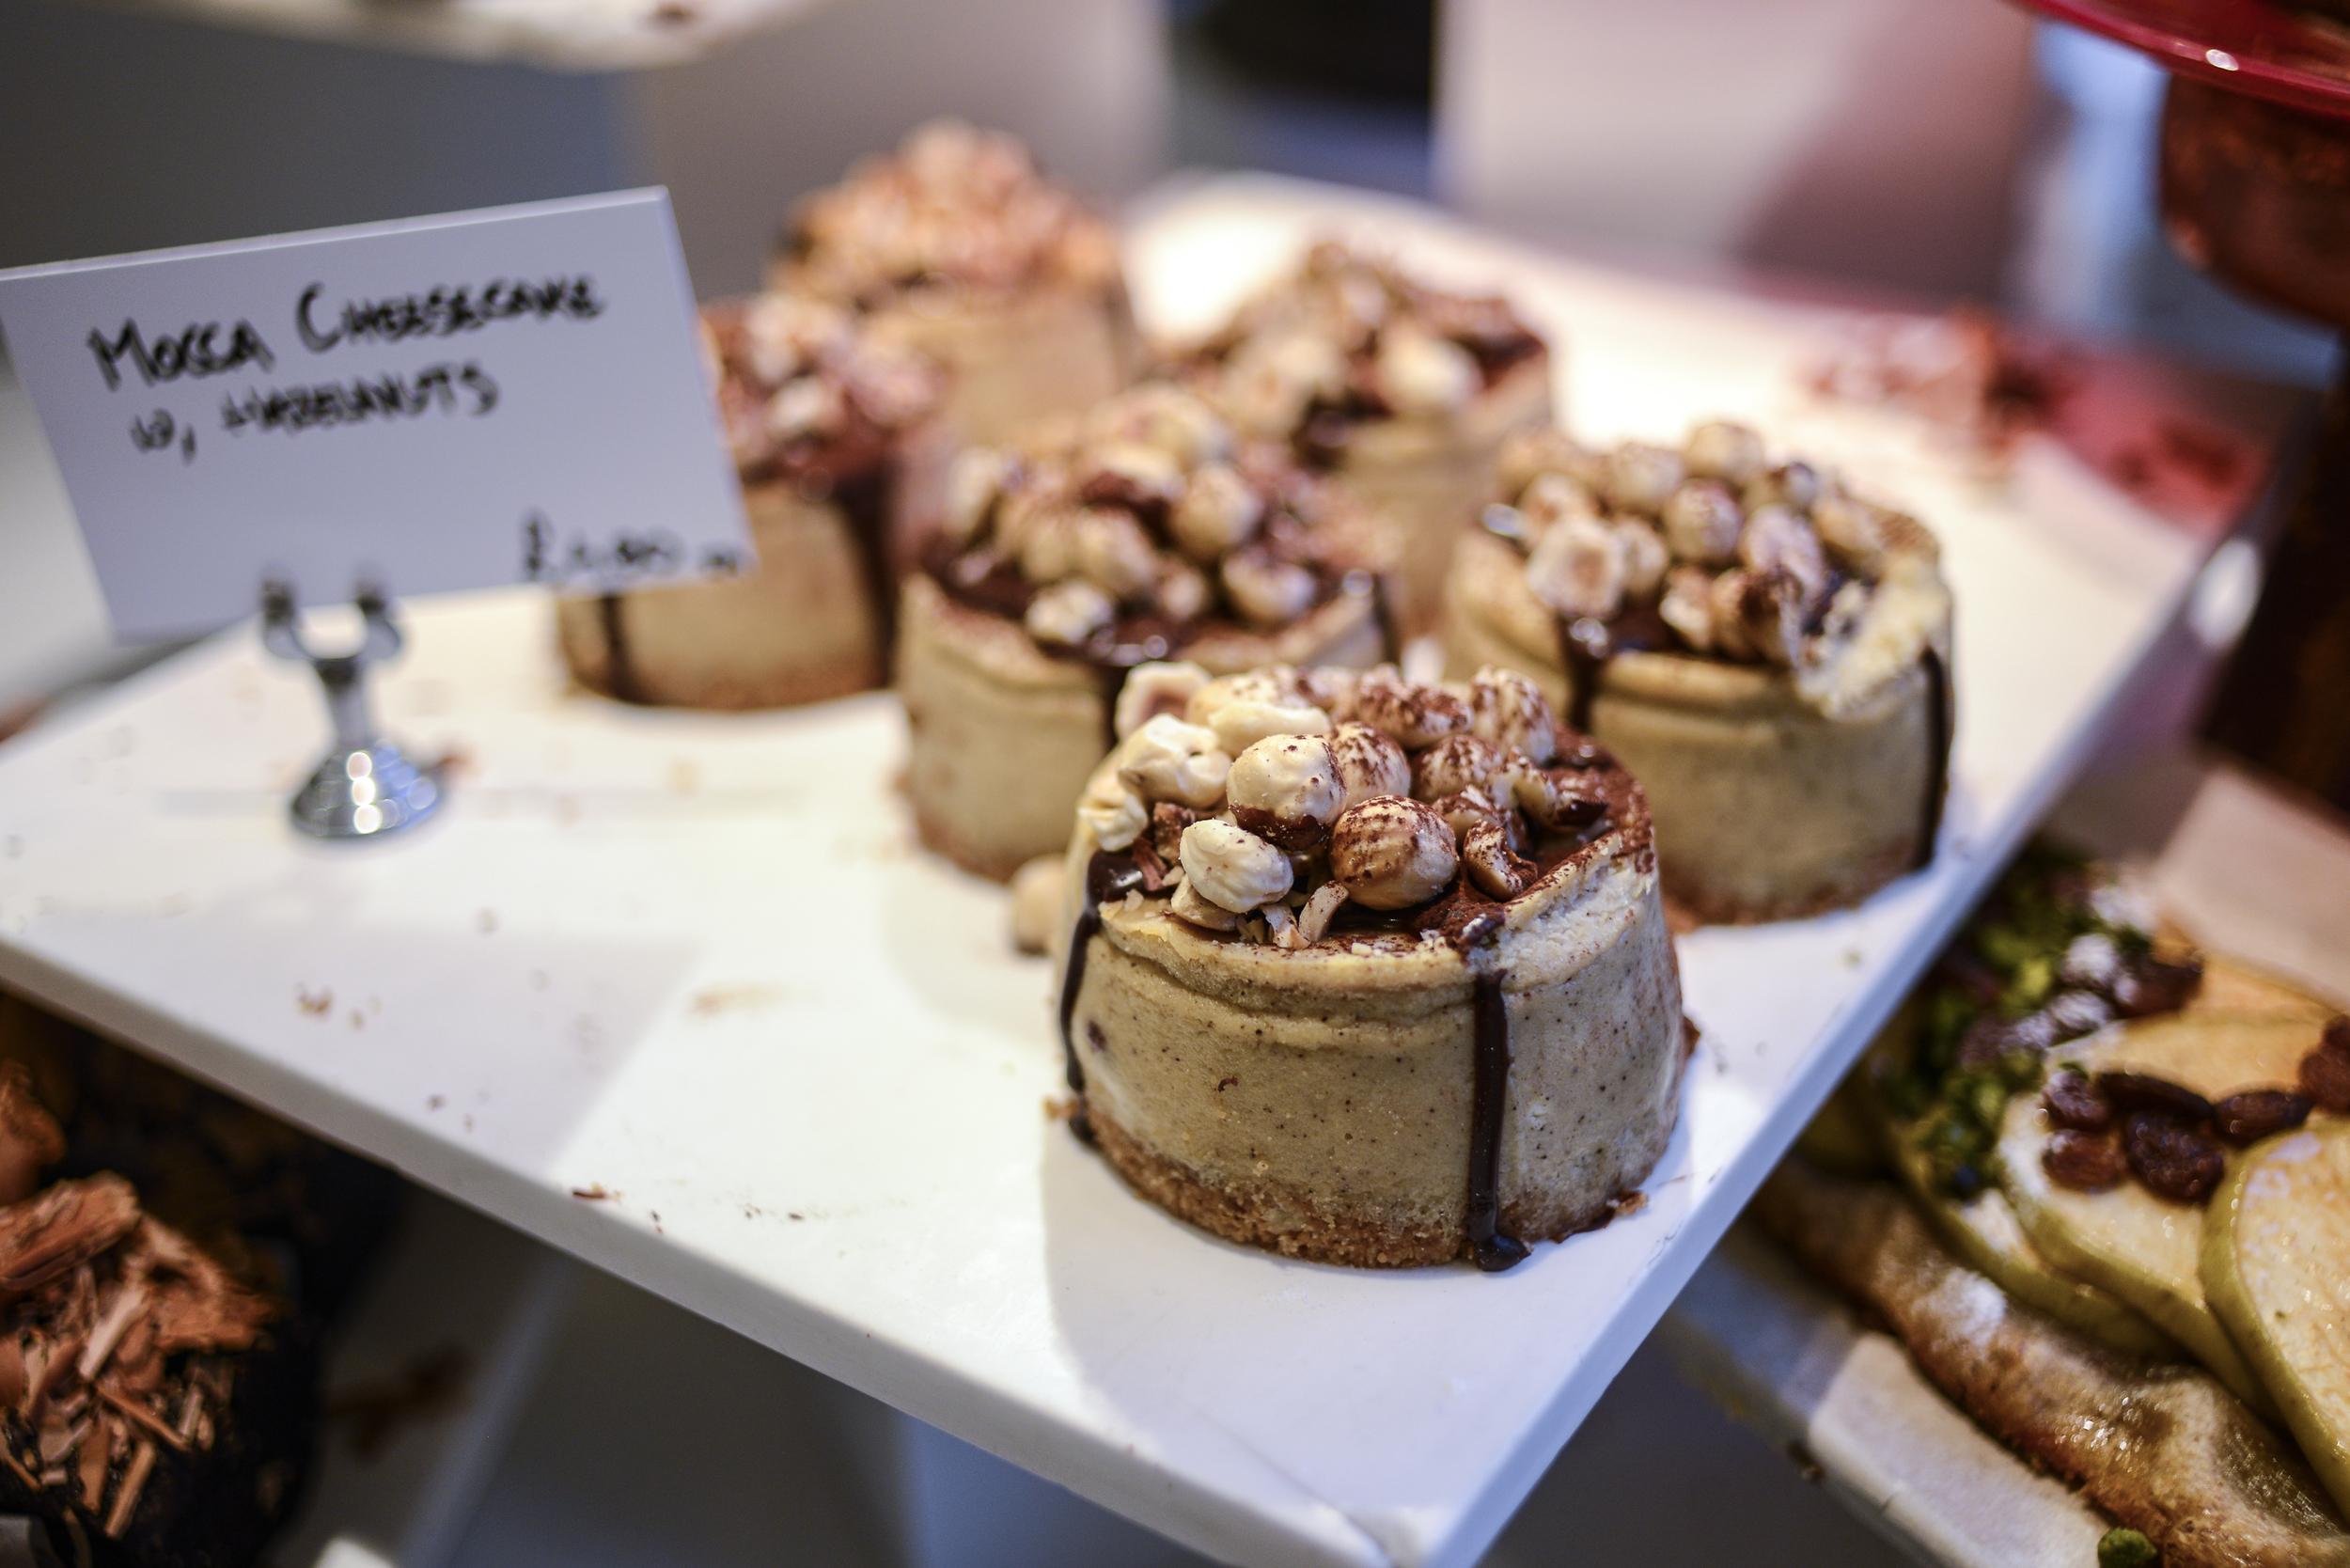 ottolenghi_pastries_aspiring_kennedy_notting_hill_noah_darnell